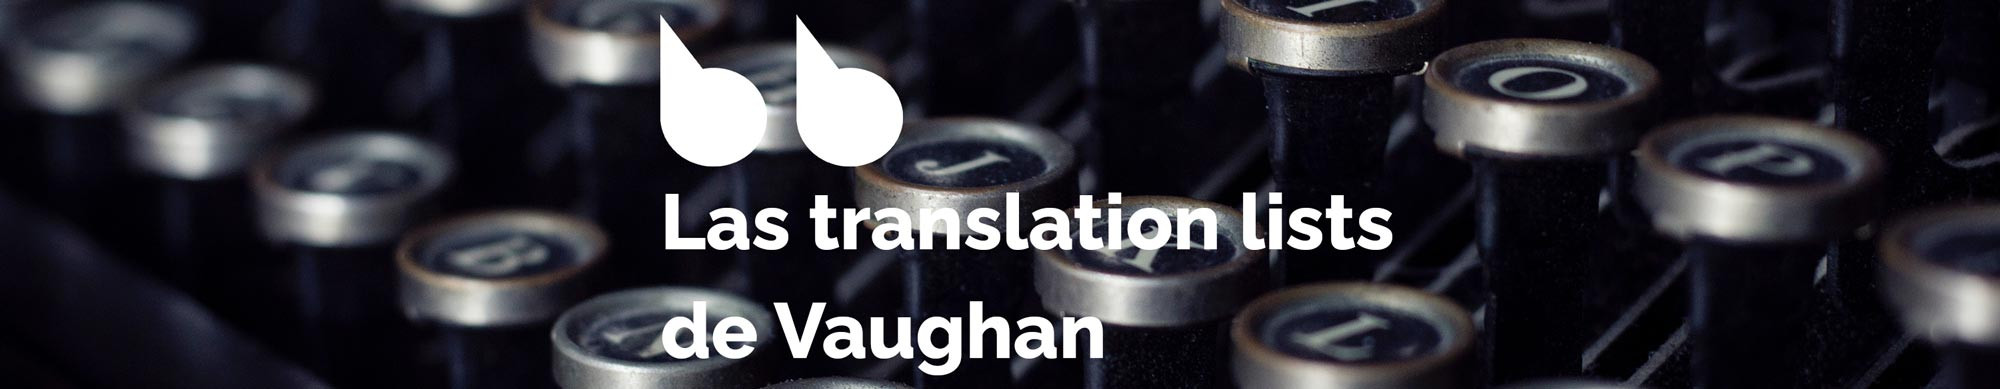 Ejercicios de inglés de nivel básico - Translation List 8